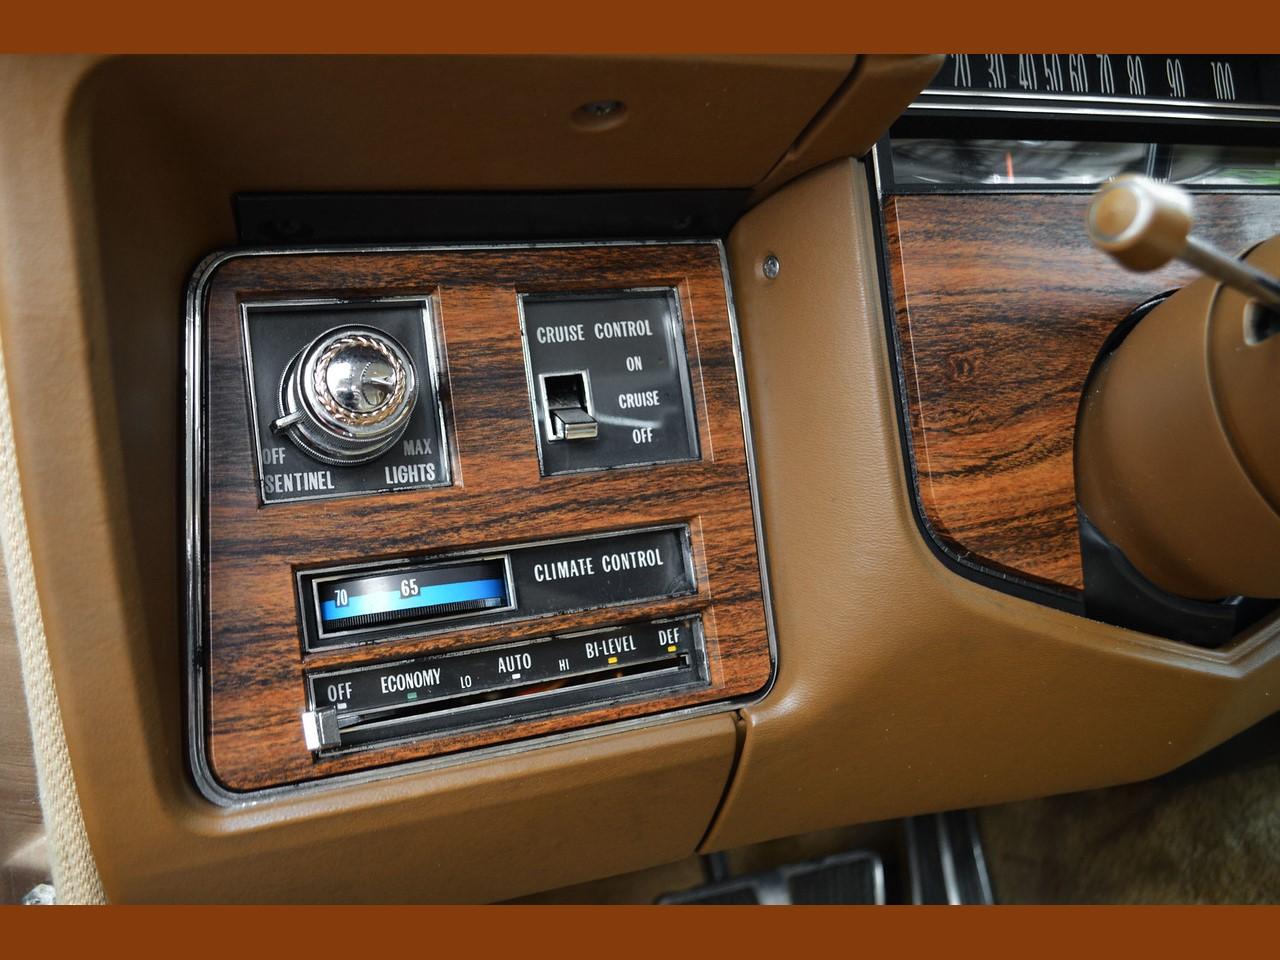 1976 Cadillac Seville 31